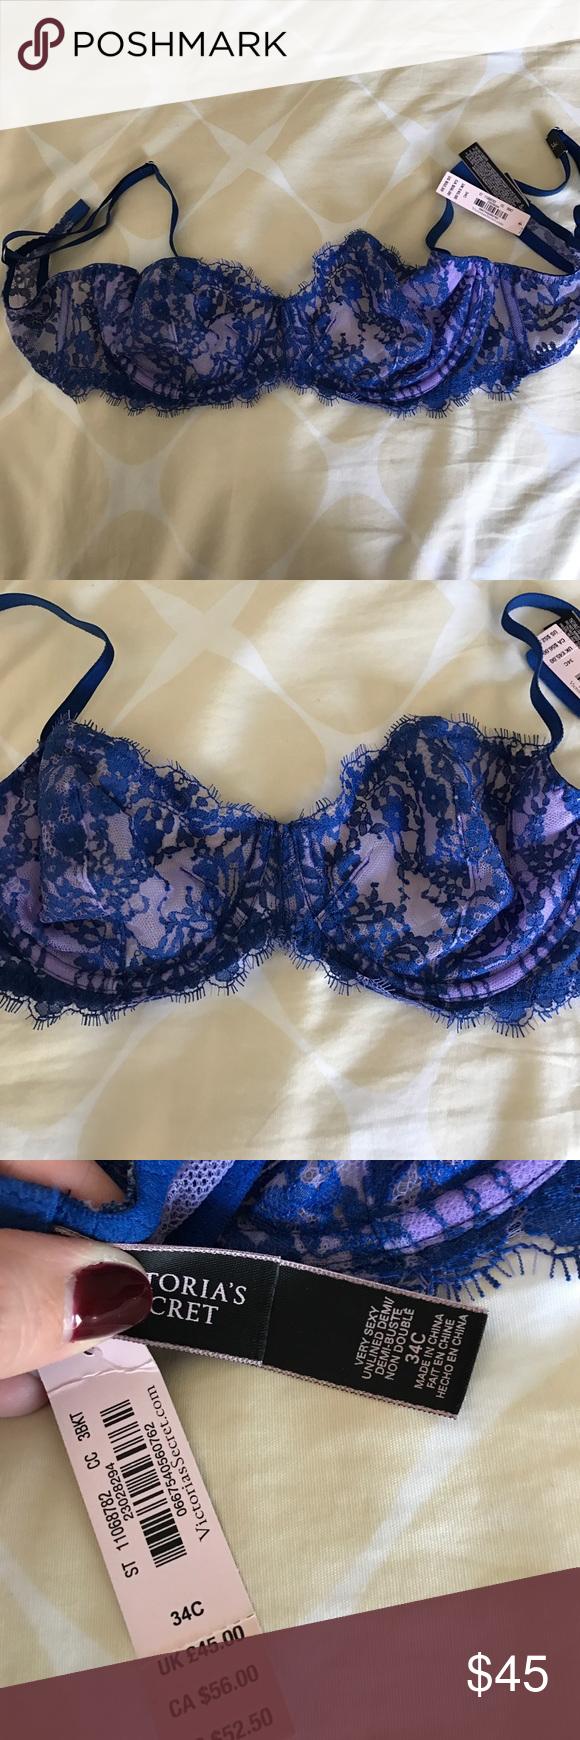 dc0bb2cb7edad NWT Victoria s Secret Very Sexy bra 34C